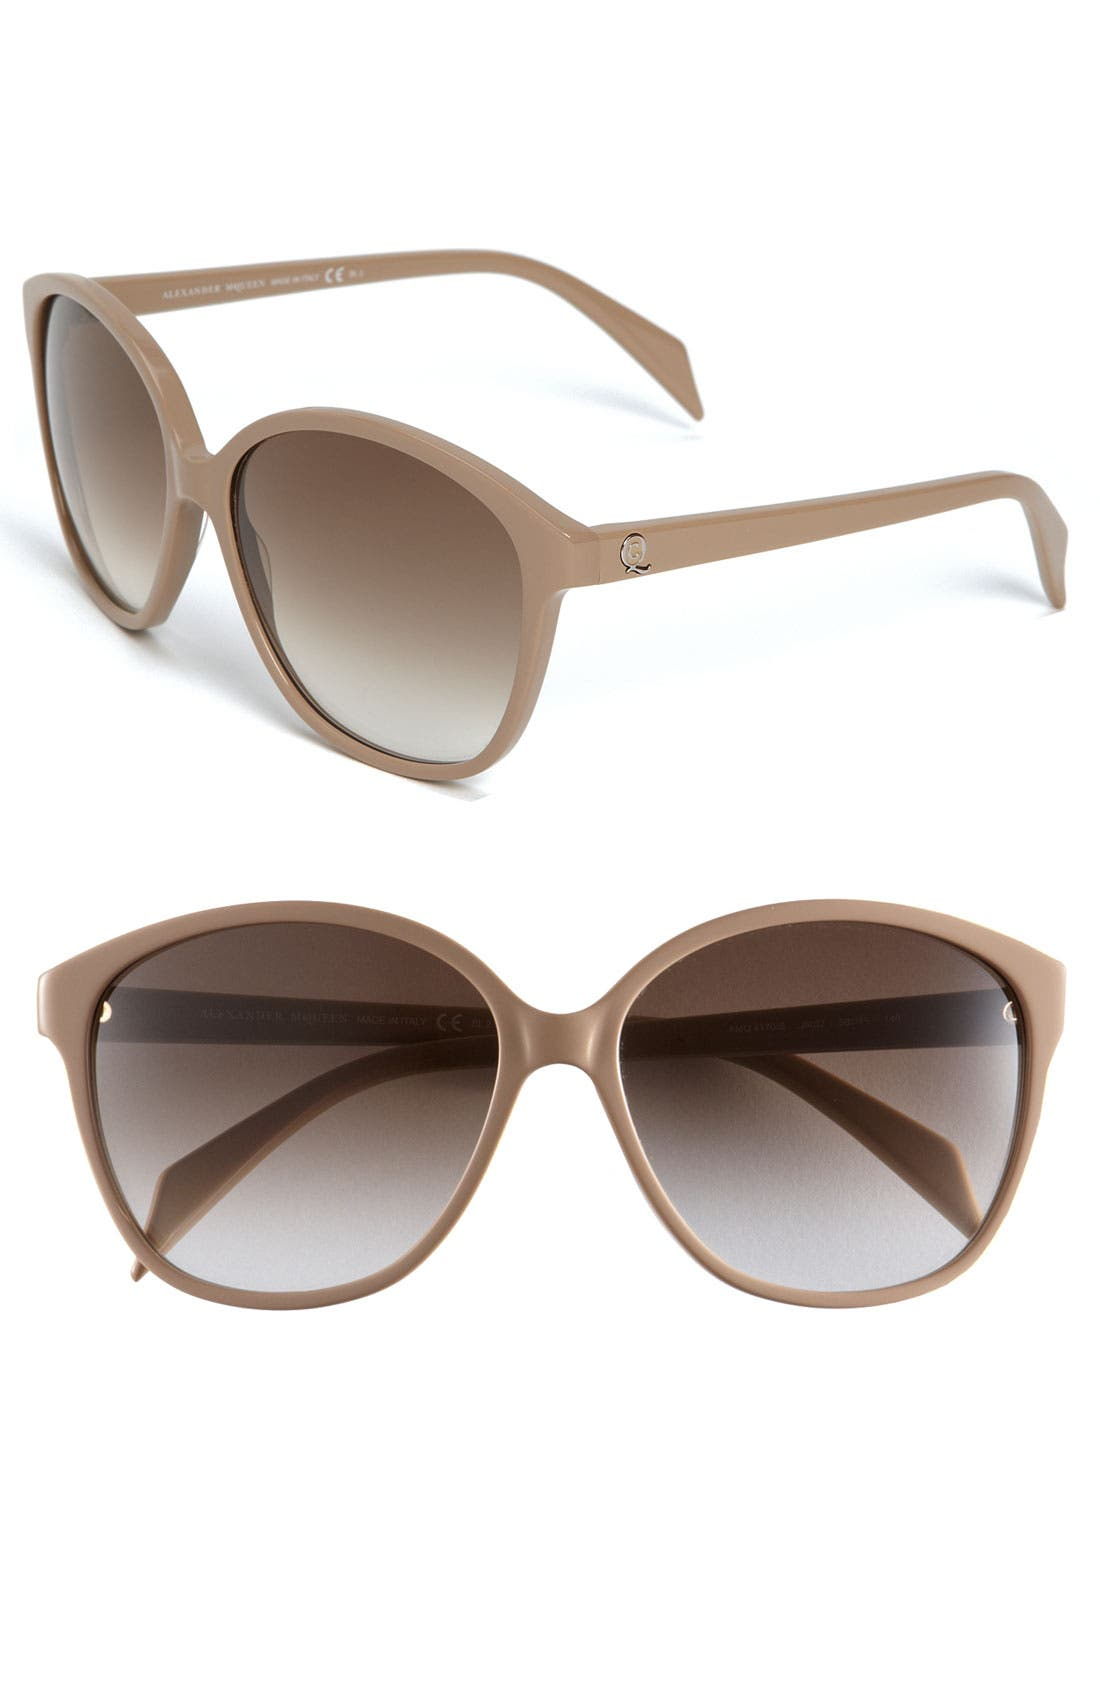 Alternate Image 1 Selected - Alexander McQueen Retro Inspired Sunglasses